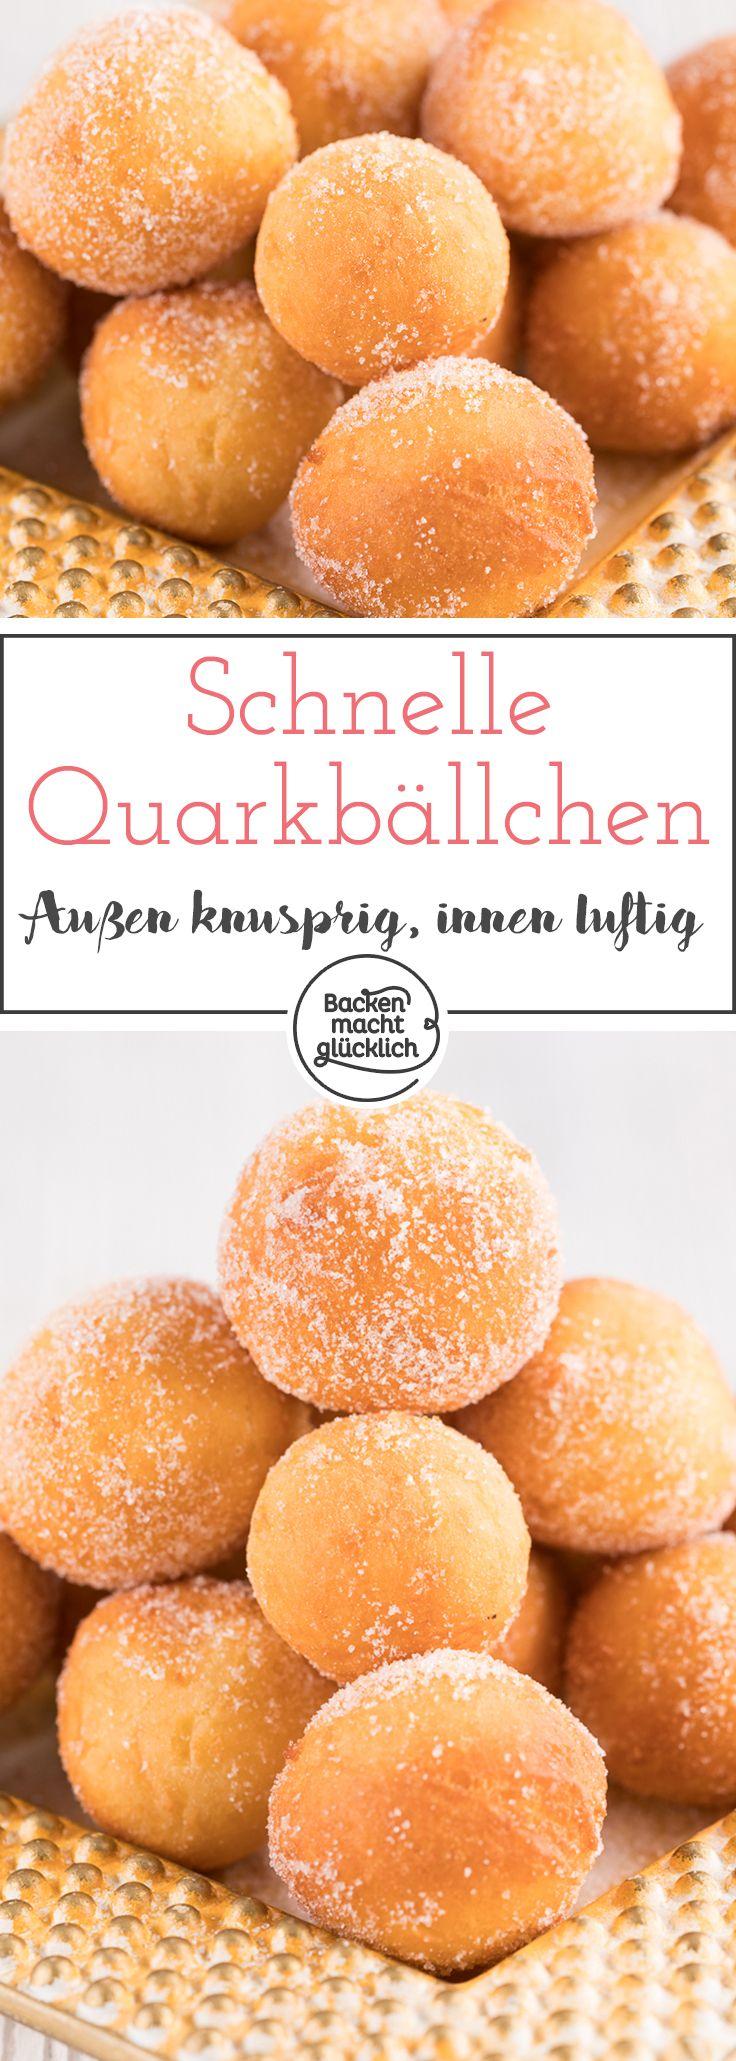 Quarkbällchen #apfelrosenmuffins